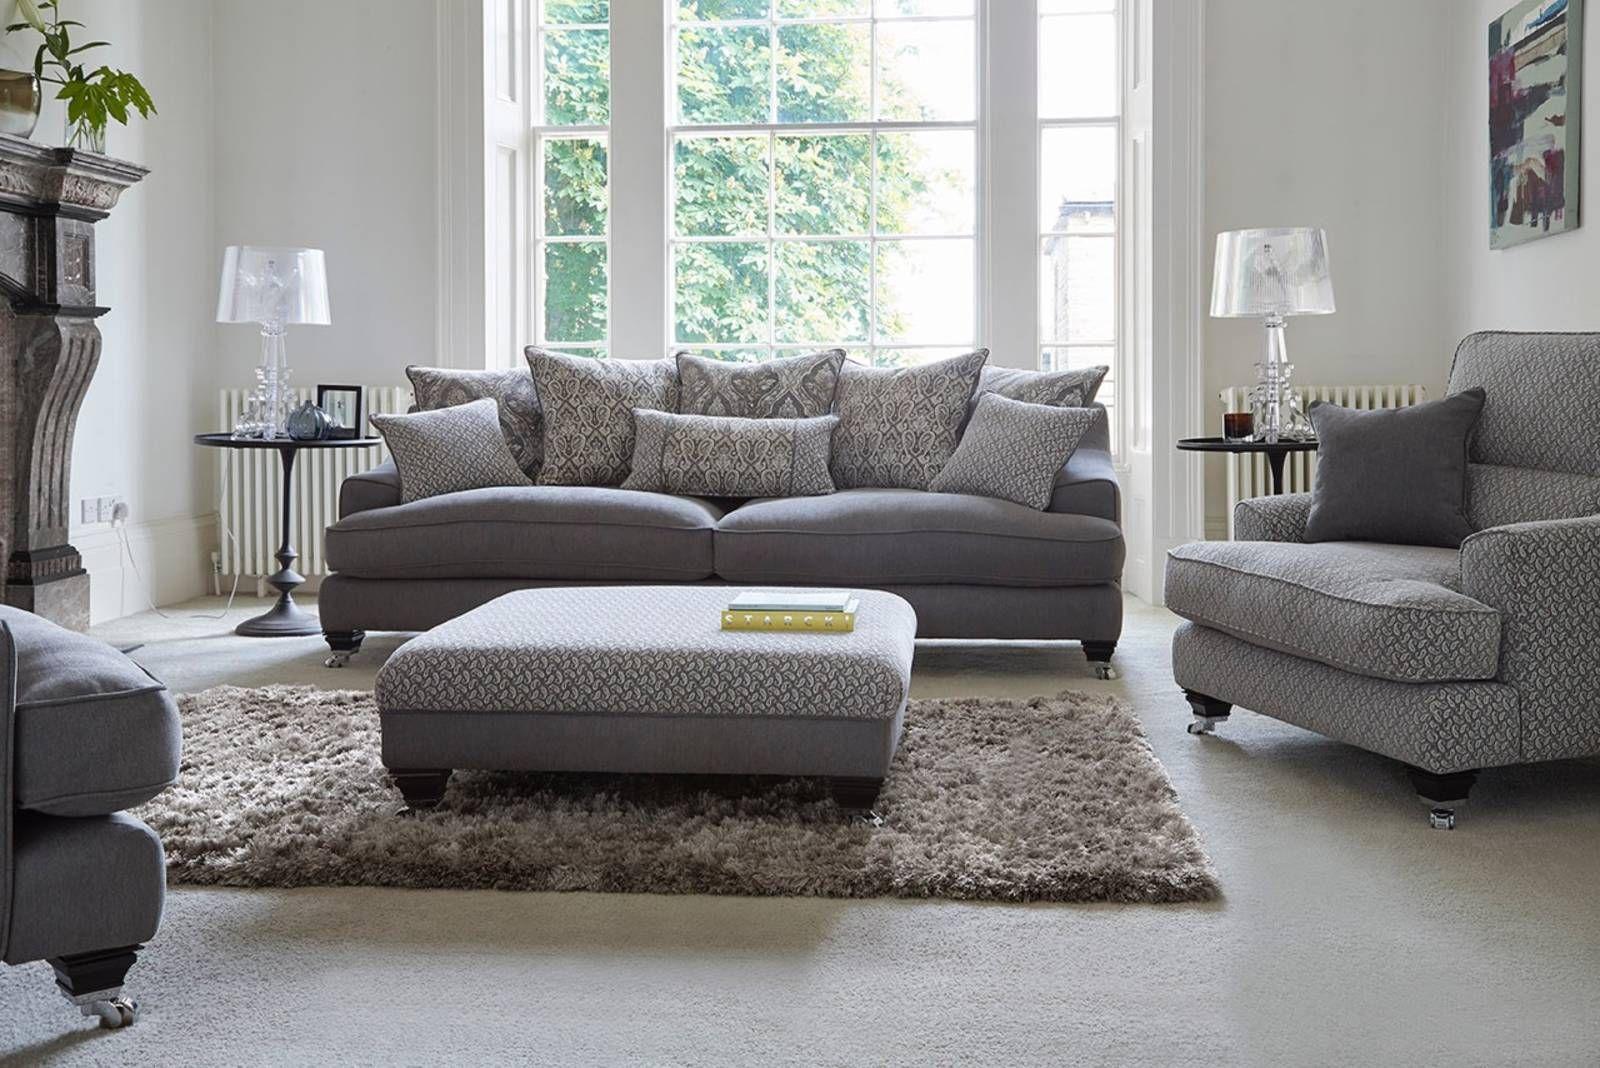 Bergen Sofology Sofa Grey Leather Corner Sofa Cushions On Sofa